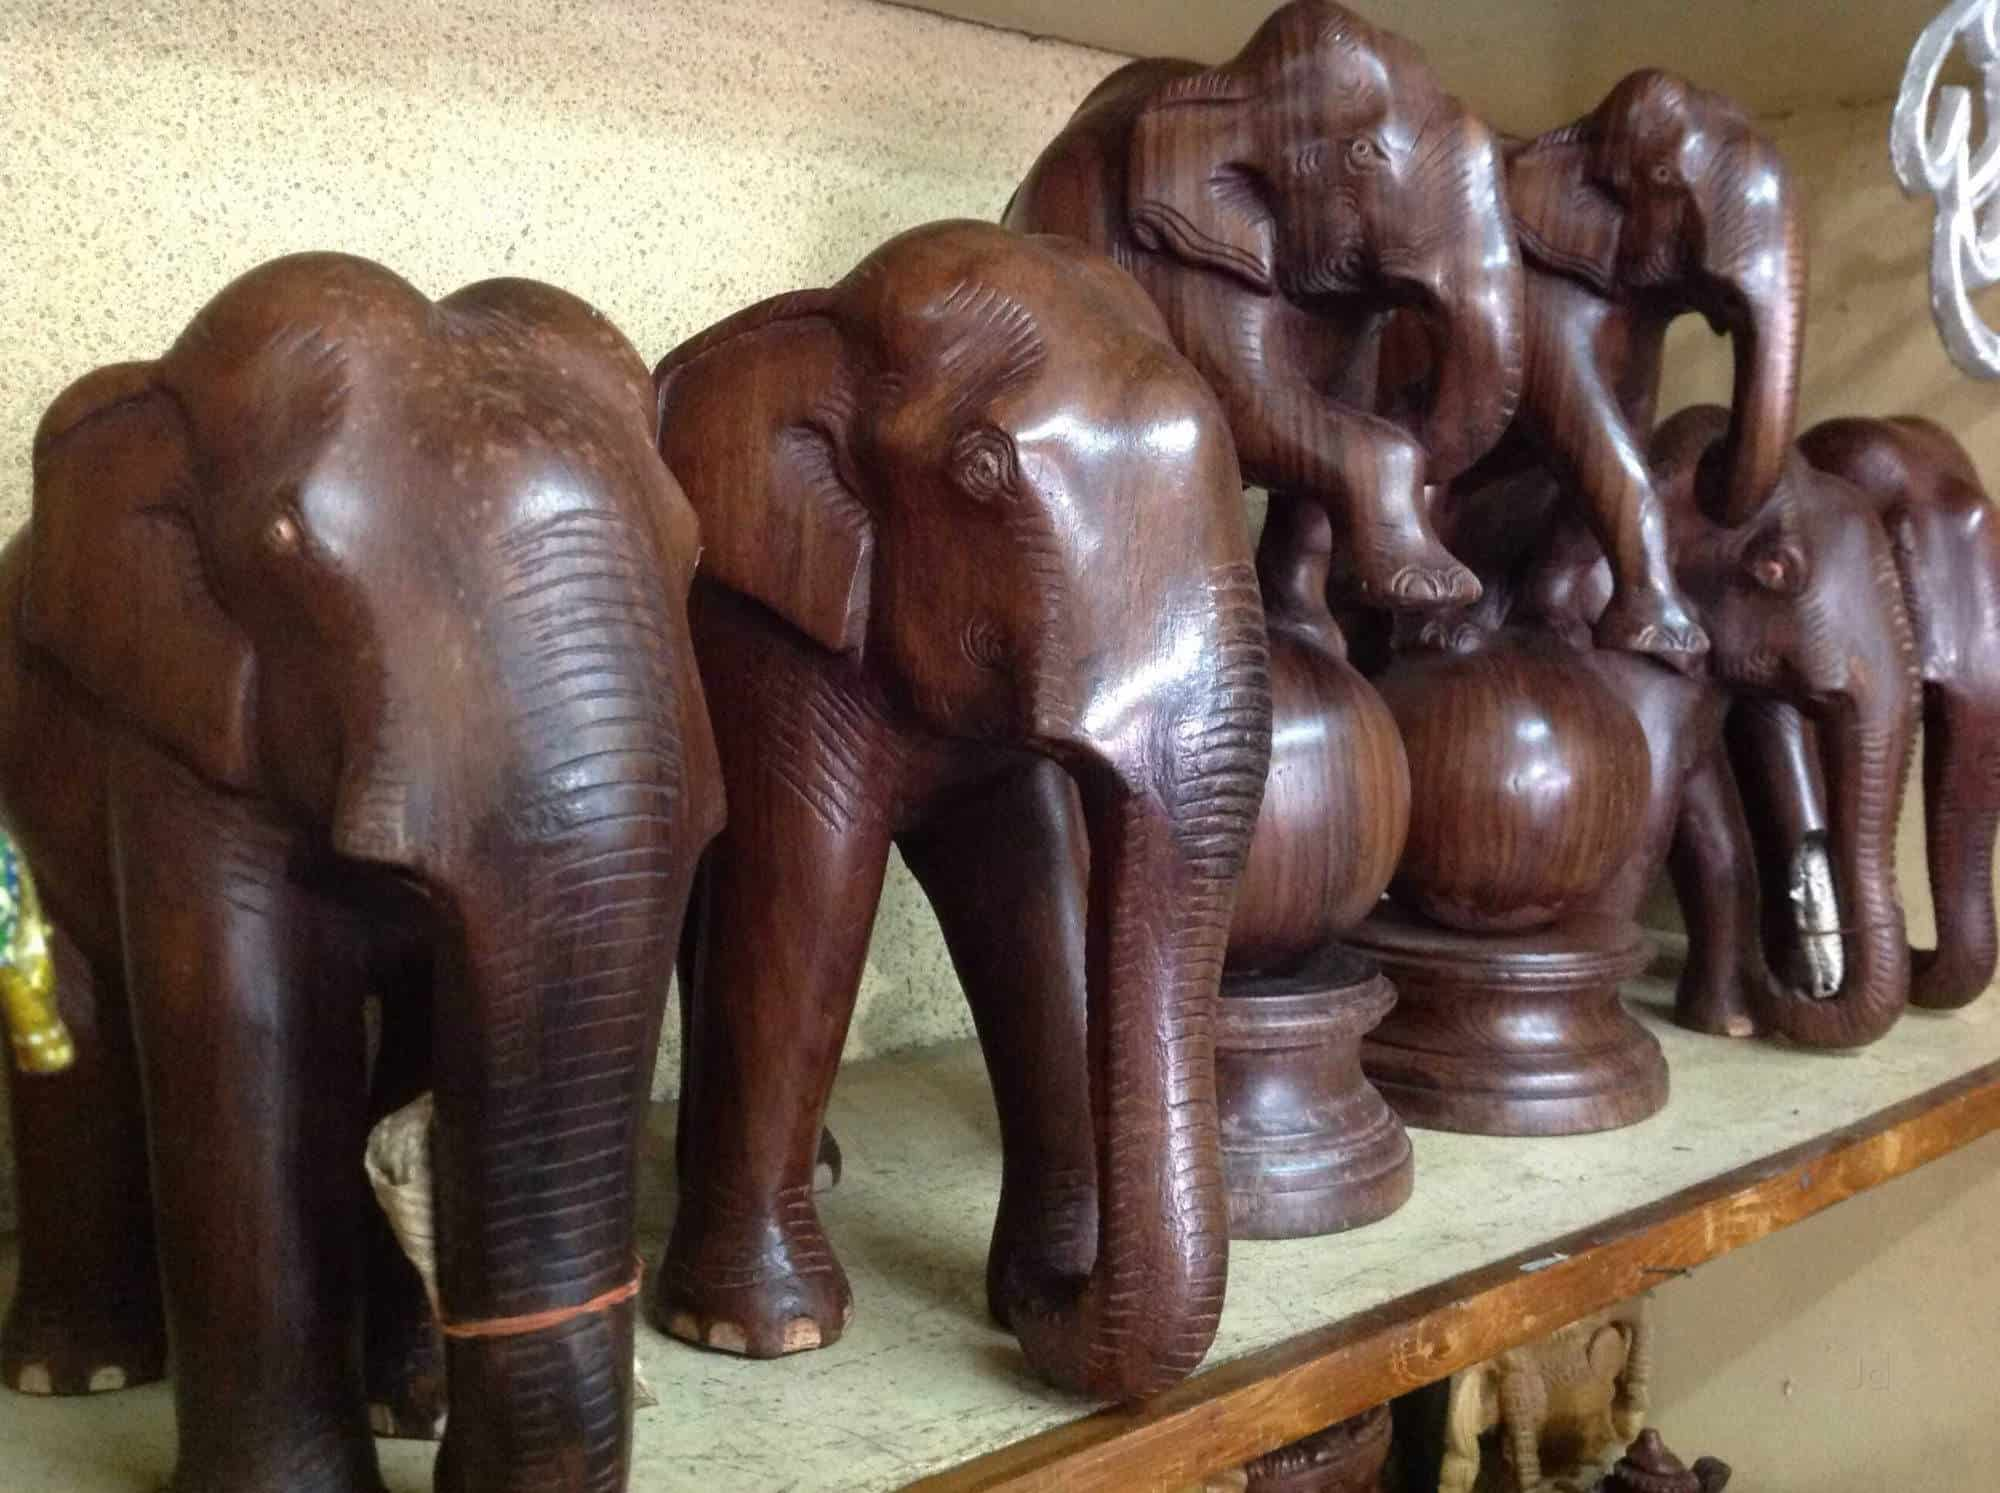 Surabhi Kerala State Handicrafts Photos Kallai Kozhikode Pictures